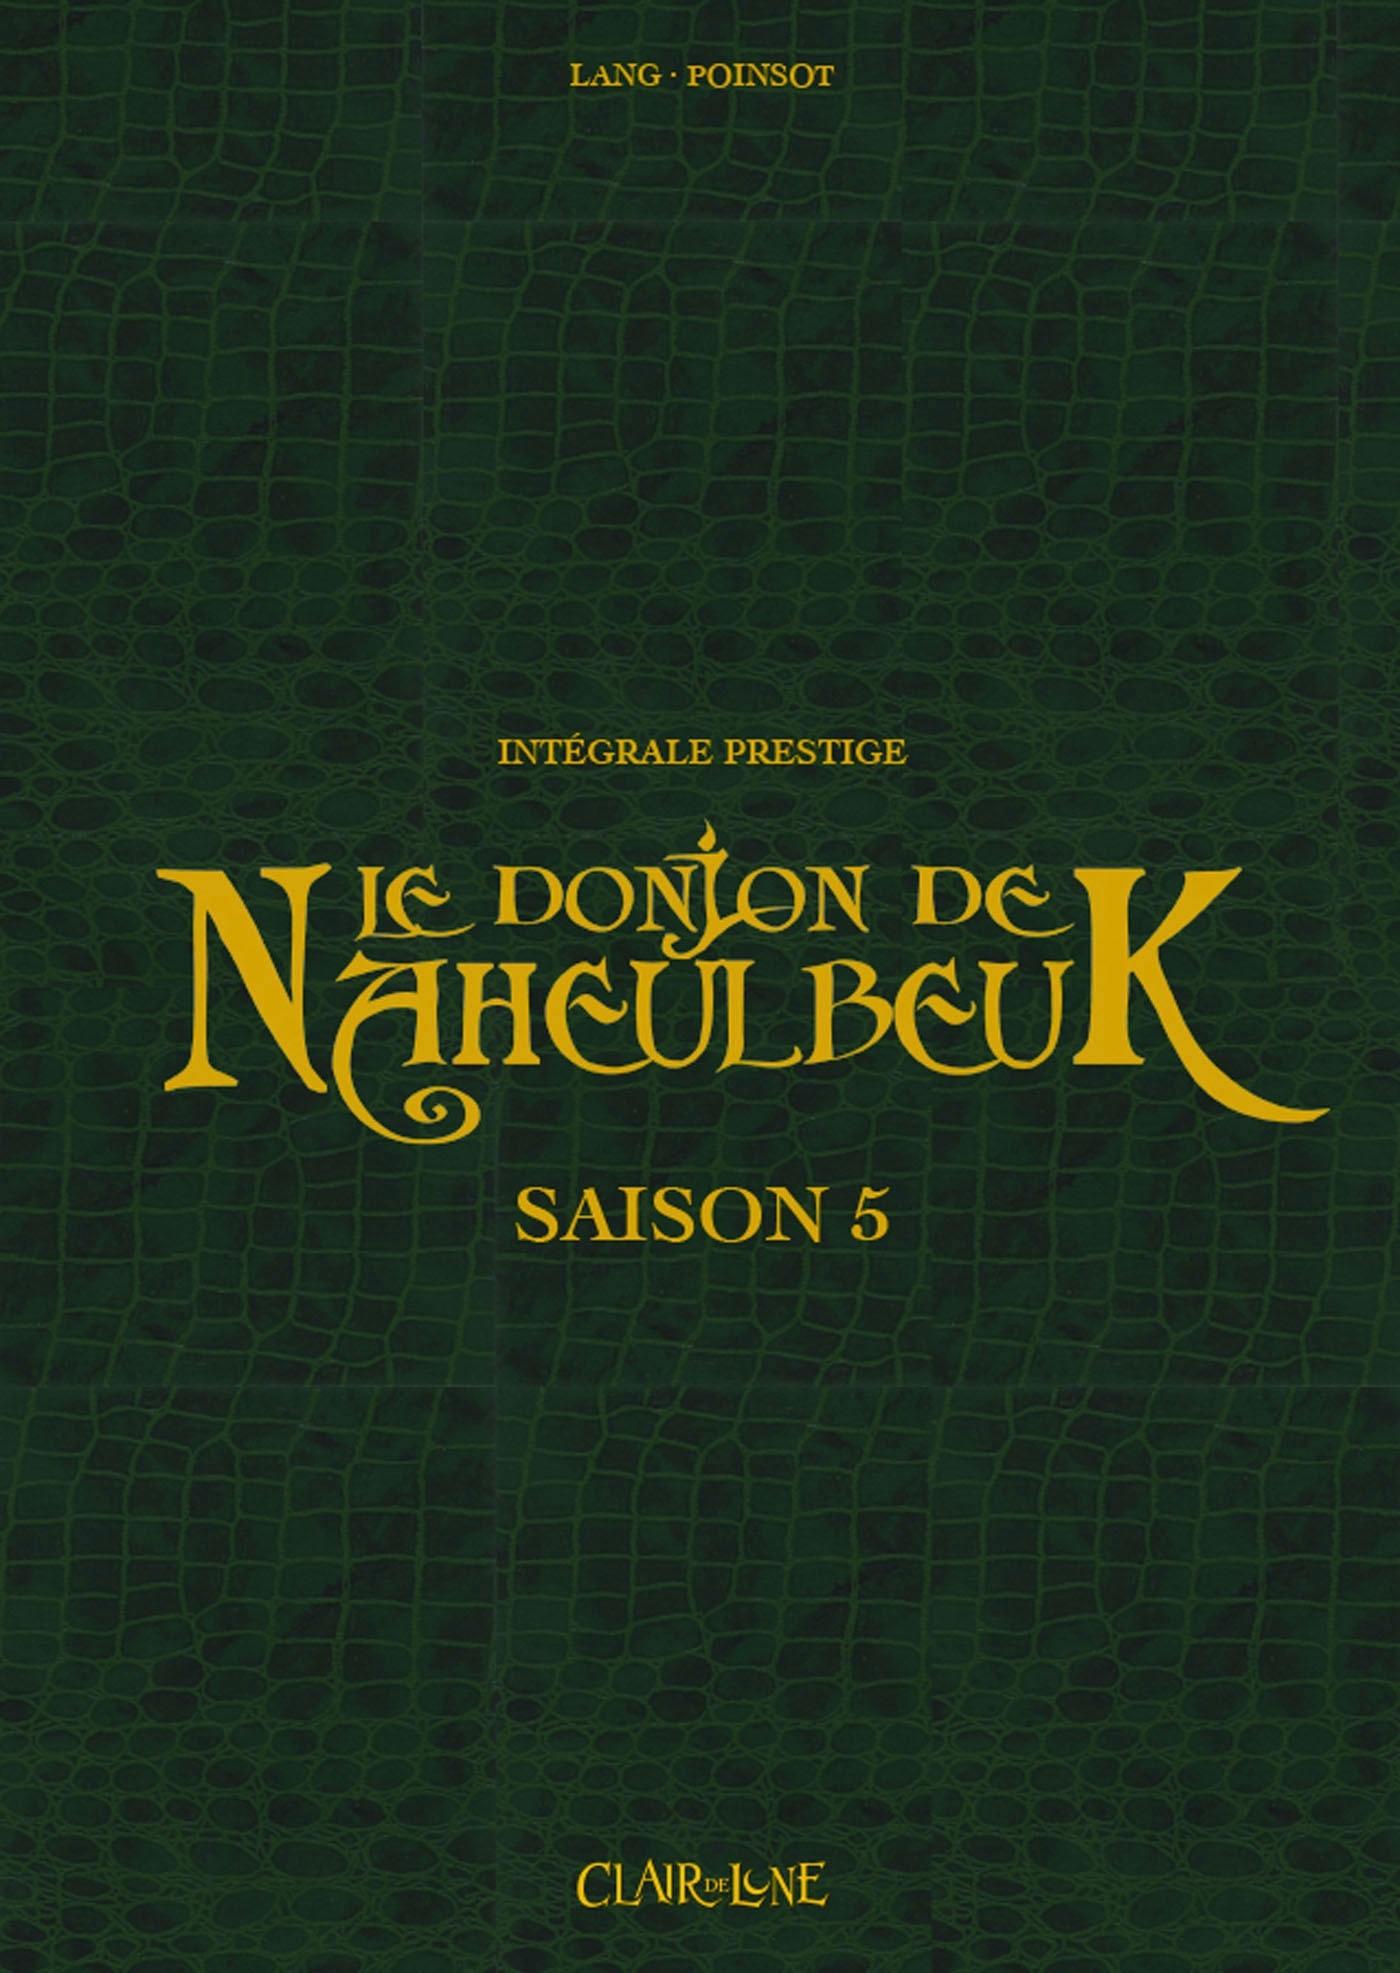 LE DONJON DE NAHEULBEUK - INTEGRALE SAISON 5